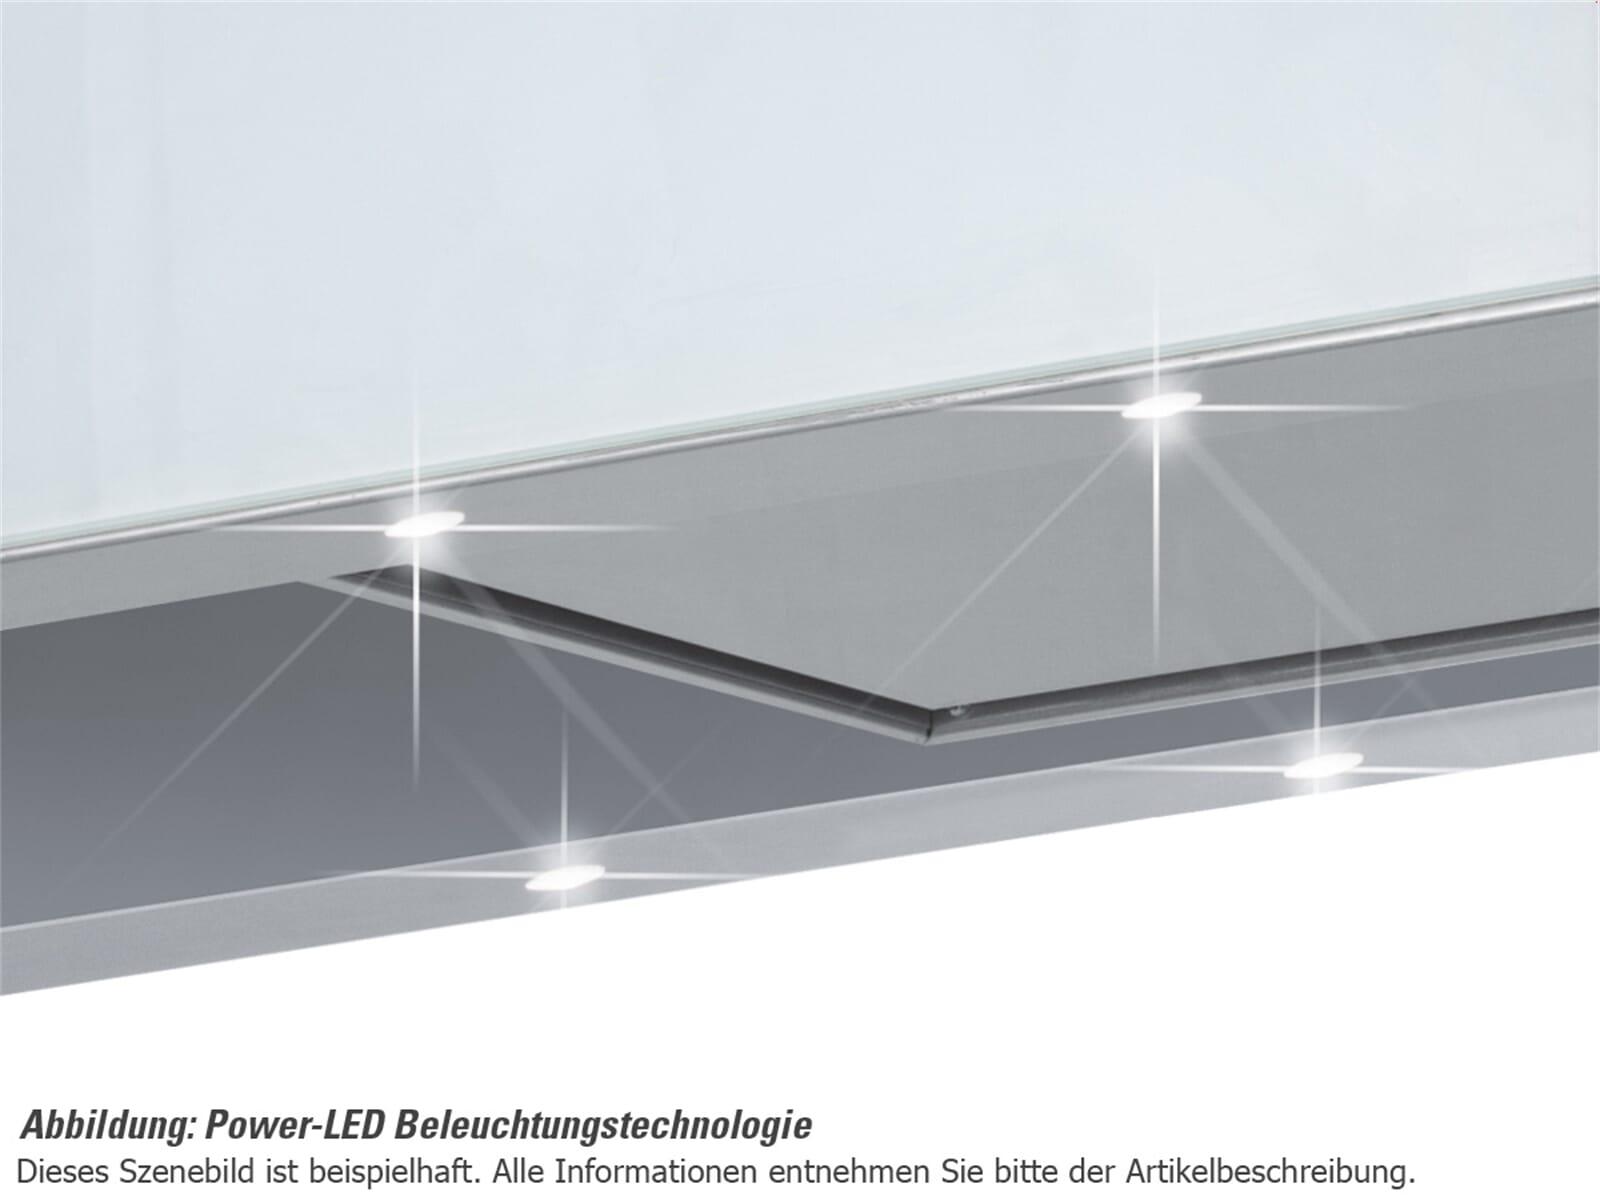 Silverline Illumina Deluxe ILW 985.3 E Wandhaube Edelstahl